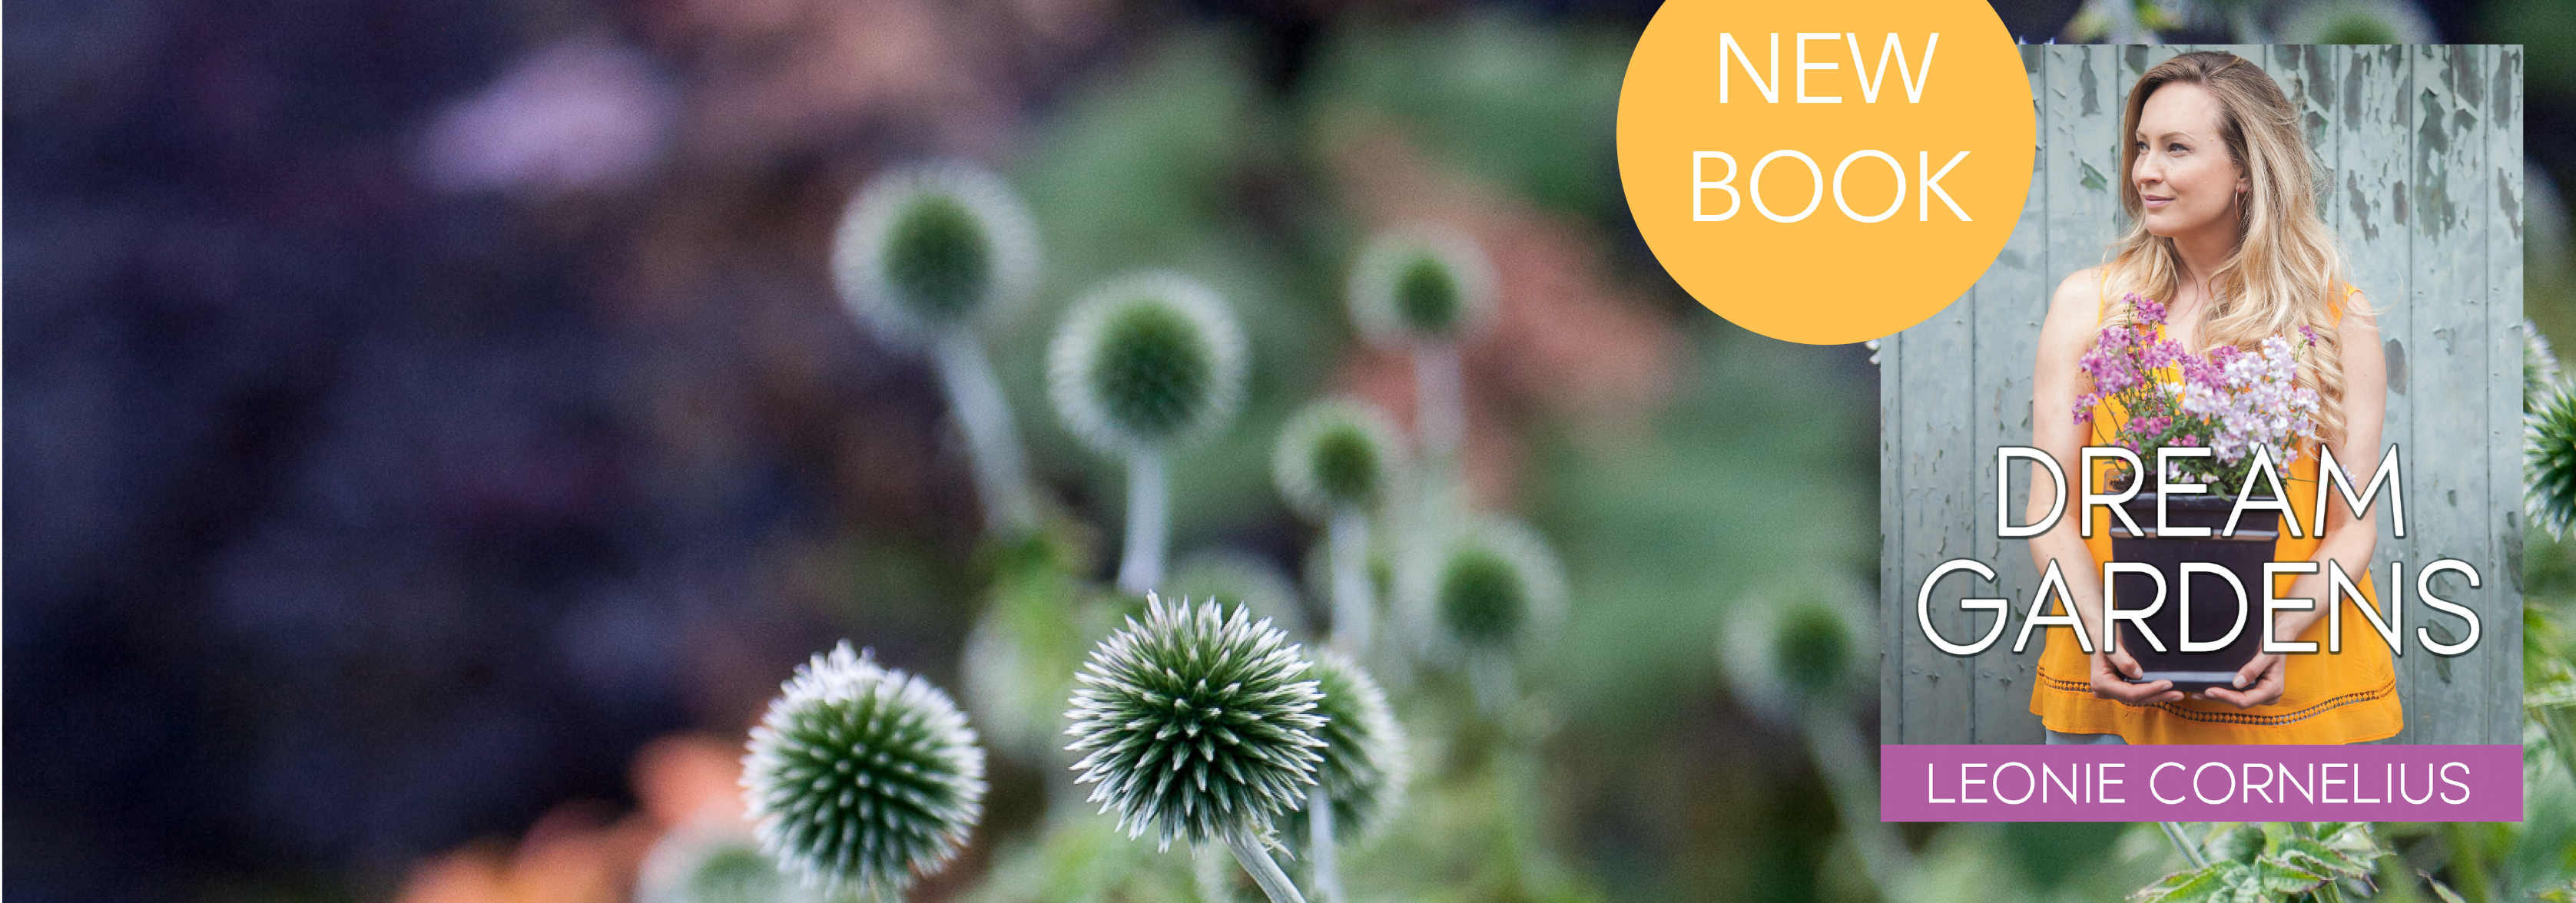 banner-Book-leonie-cornelius-dream-gardens